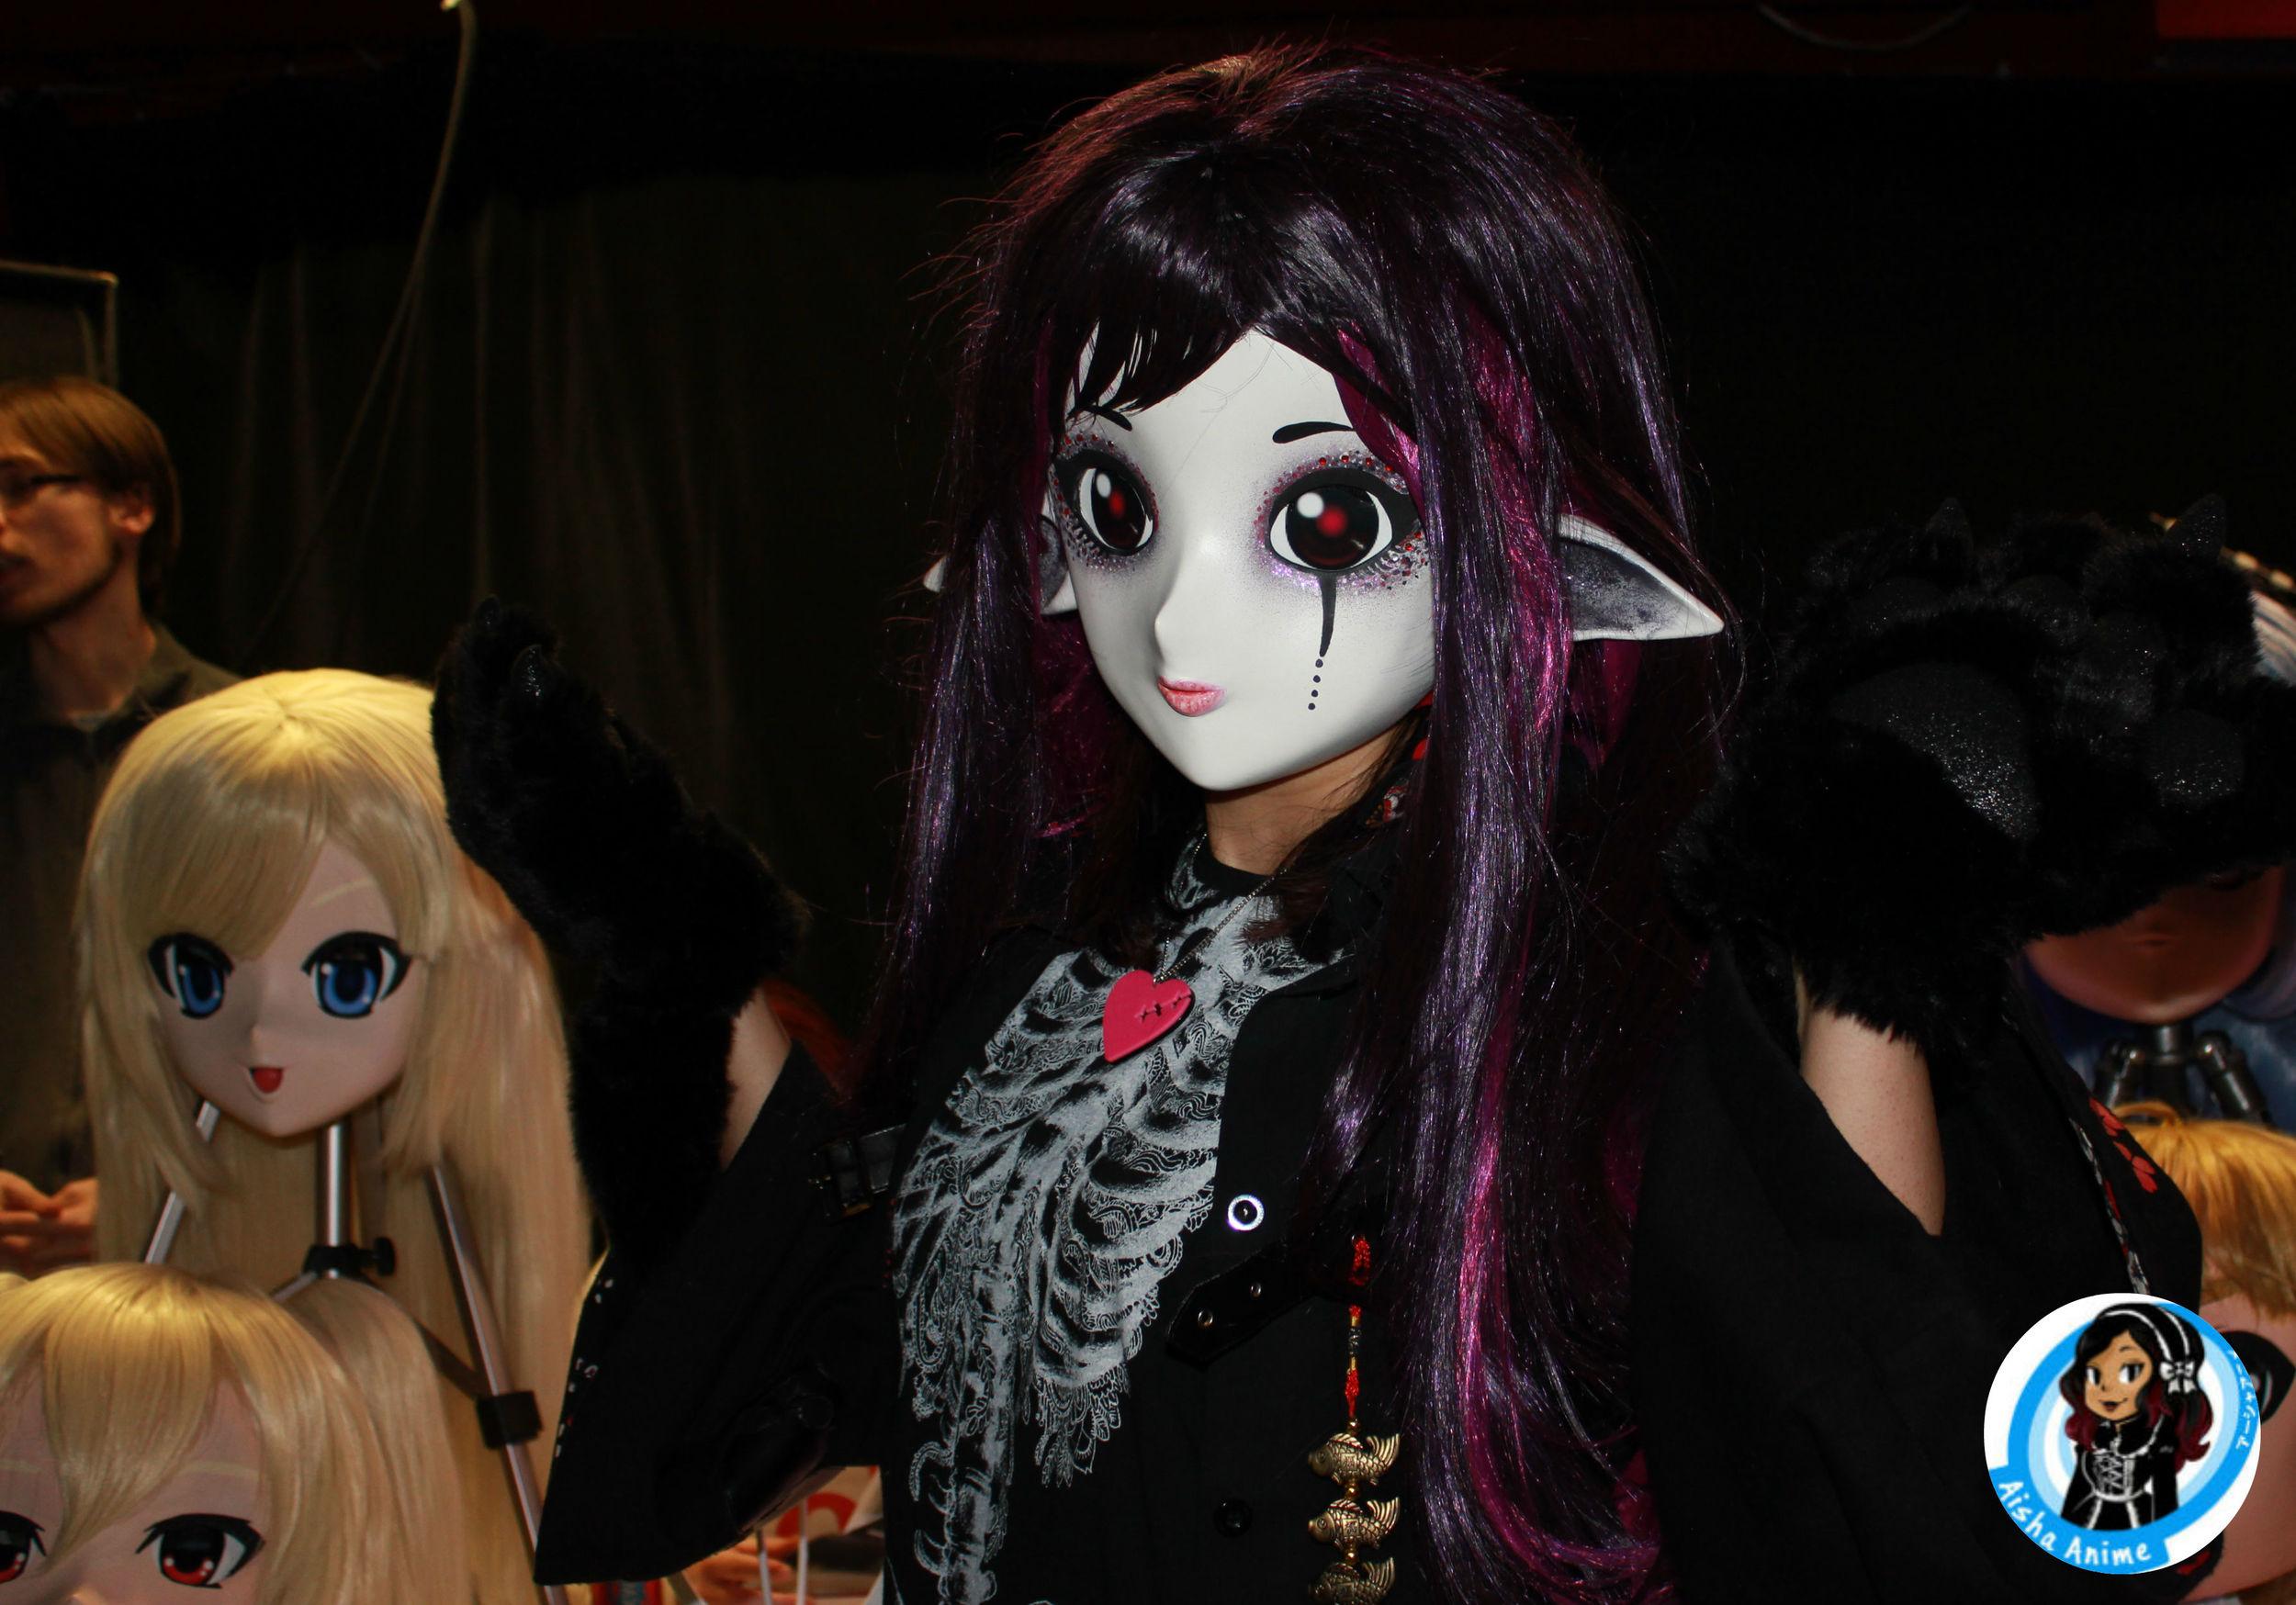 Charming Kitsune masks